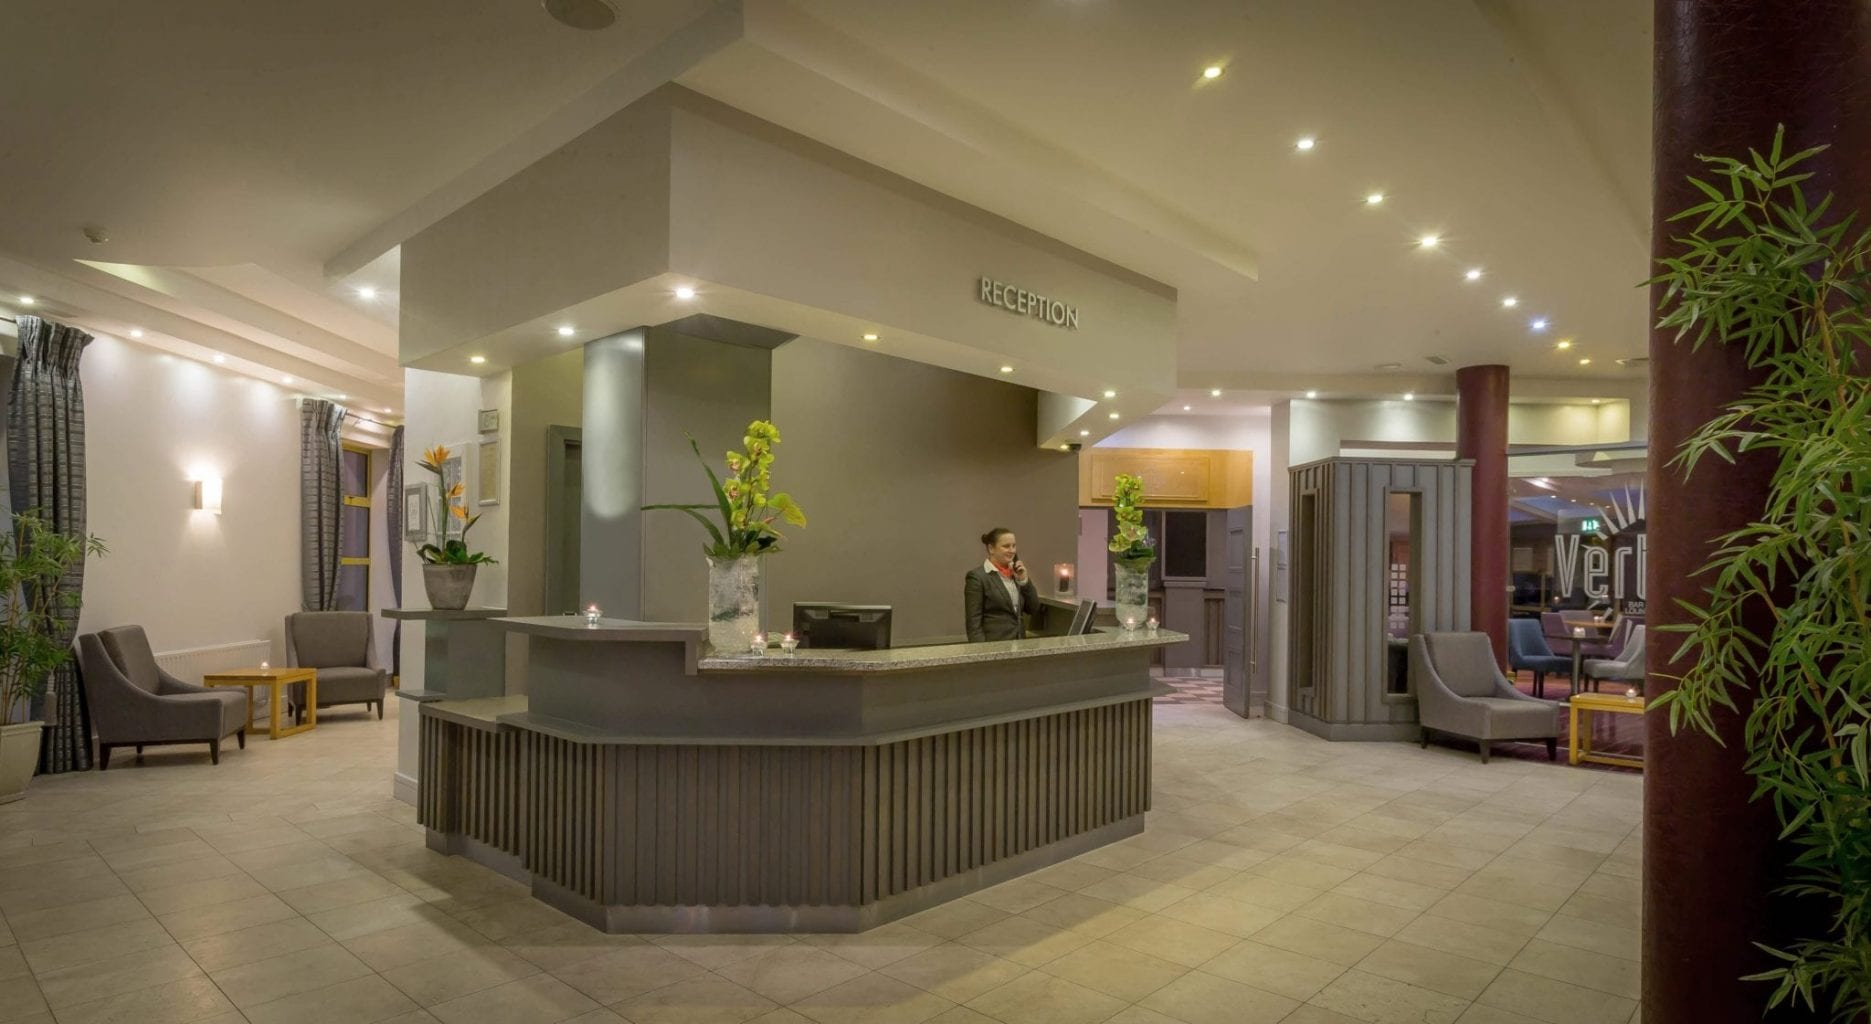 Maldron Hotel Wexford reception